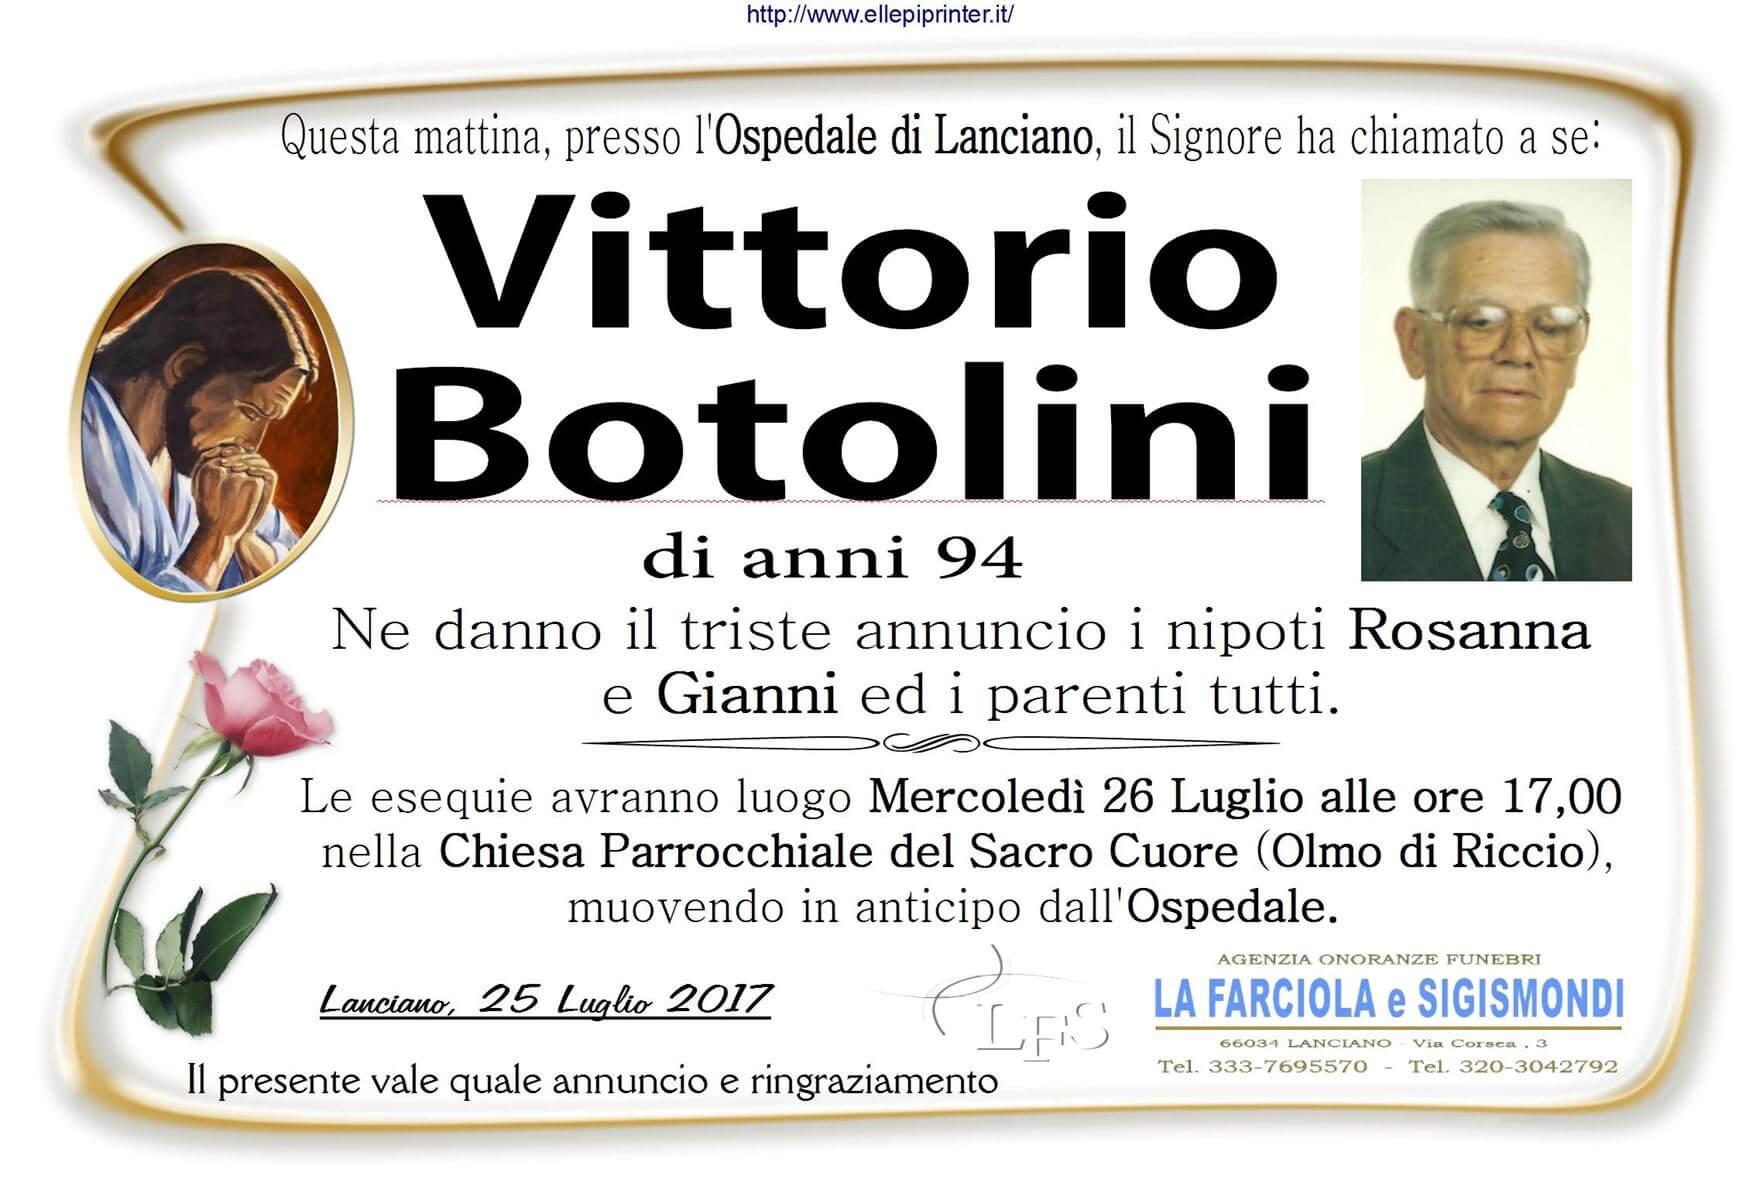 Necrologio Lanciano - Vittorio Botolini